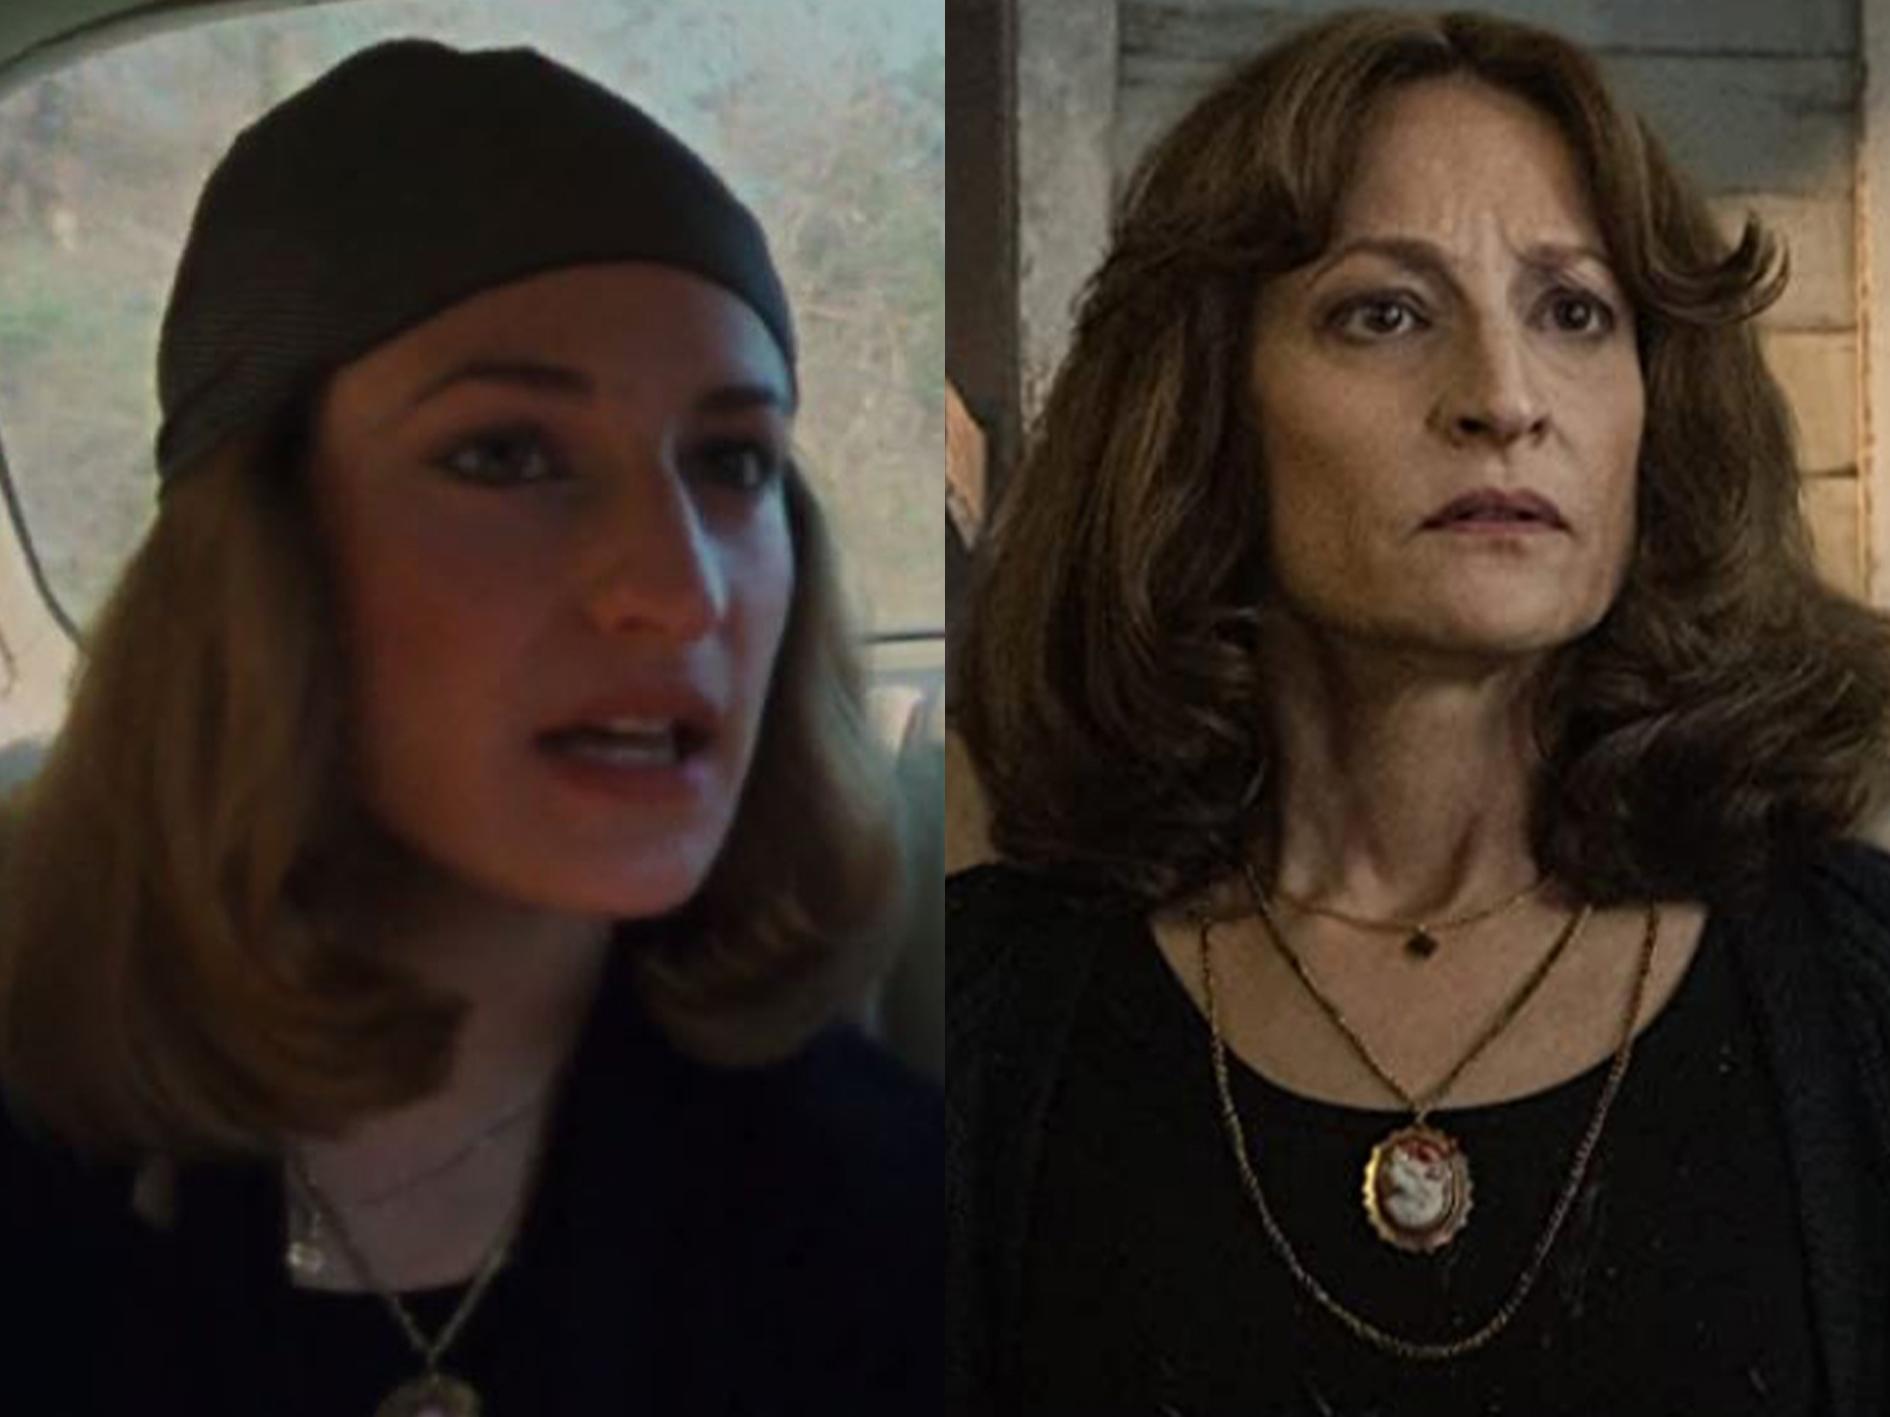 The Evil Dead Ellen Sandweiss You Won't Believe What The Cast Of The Evil Dead Look Like Now!